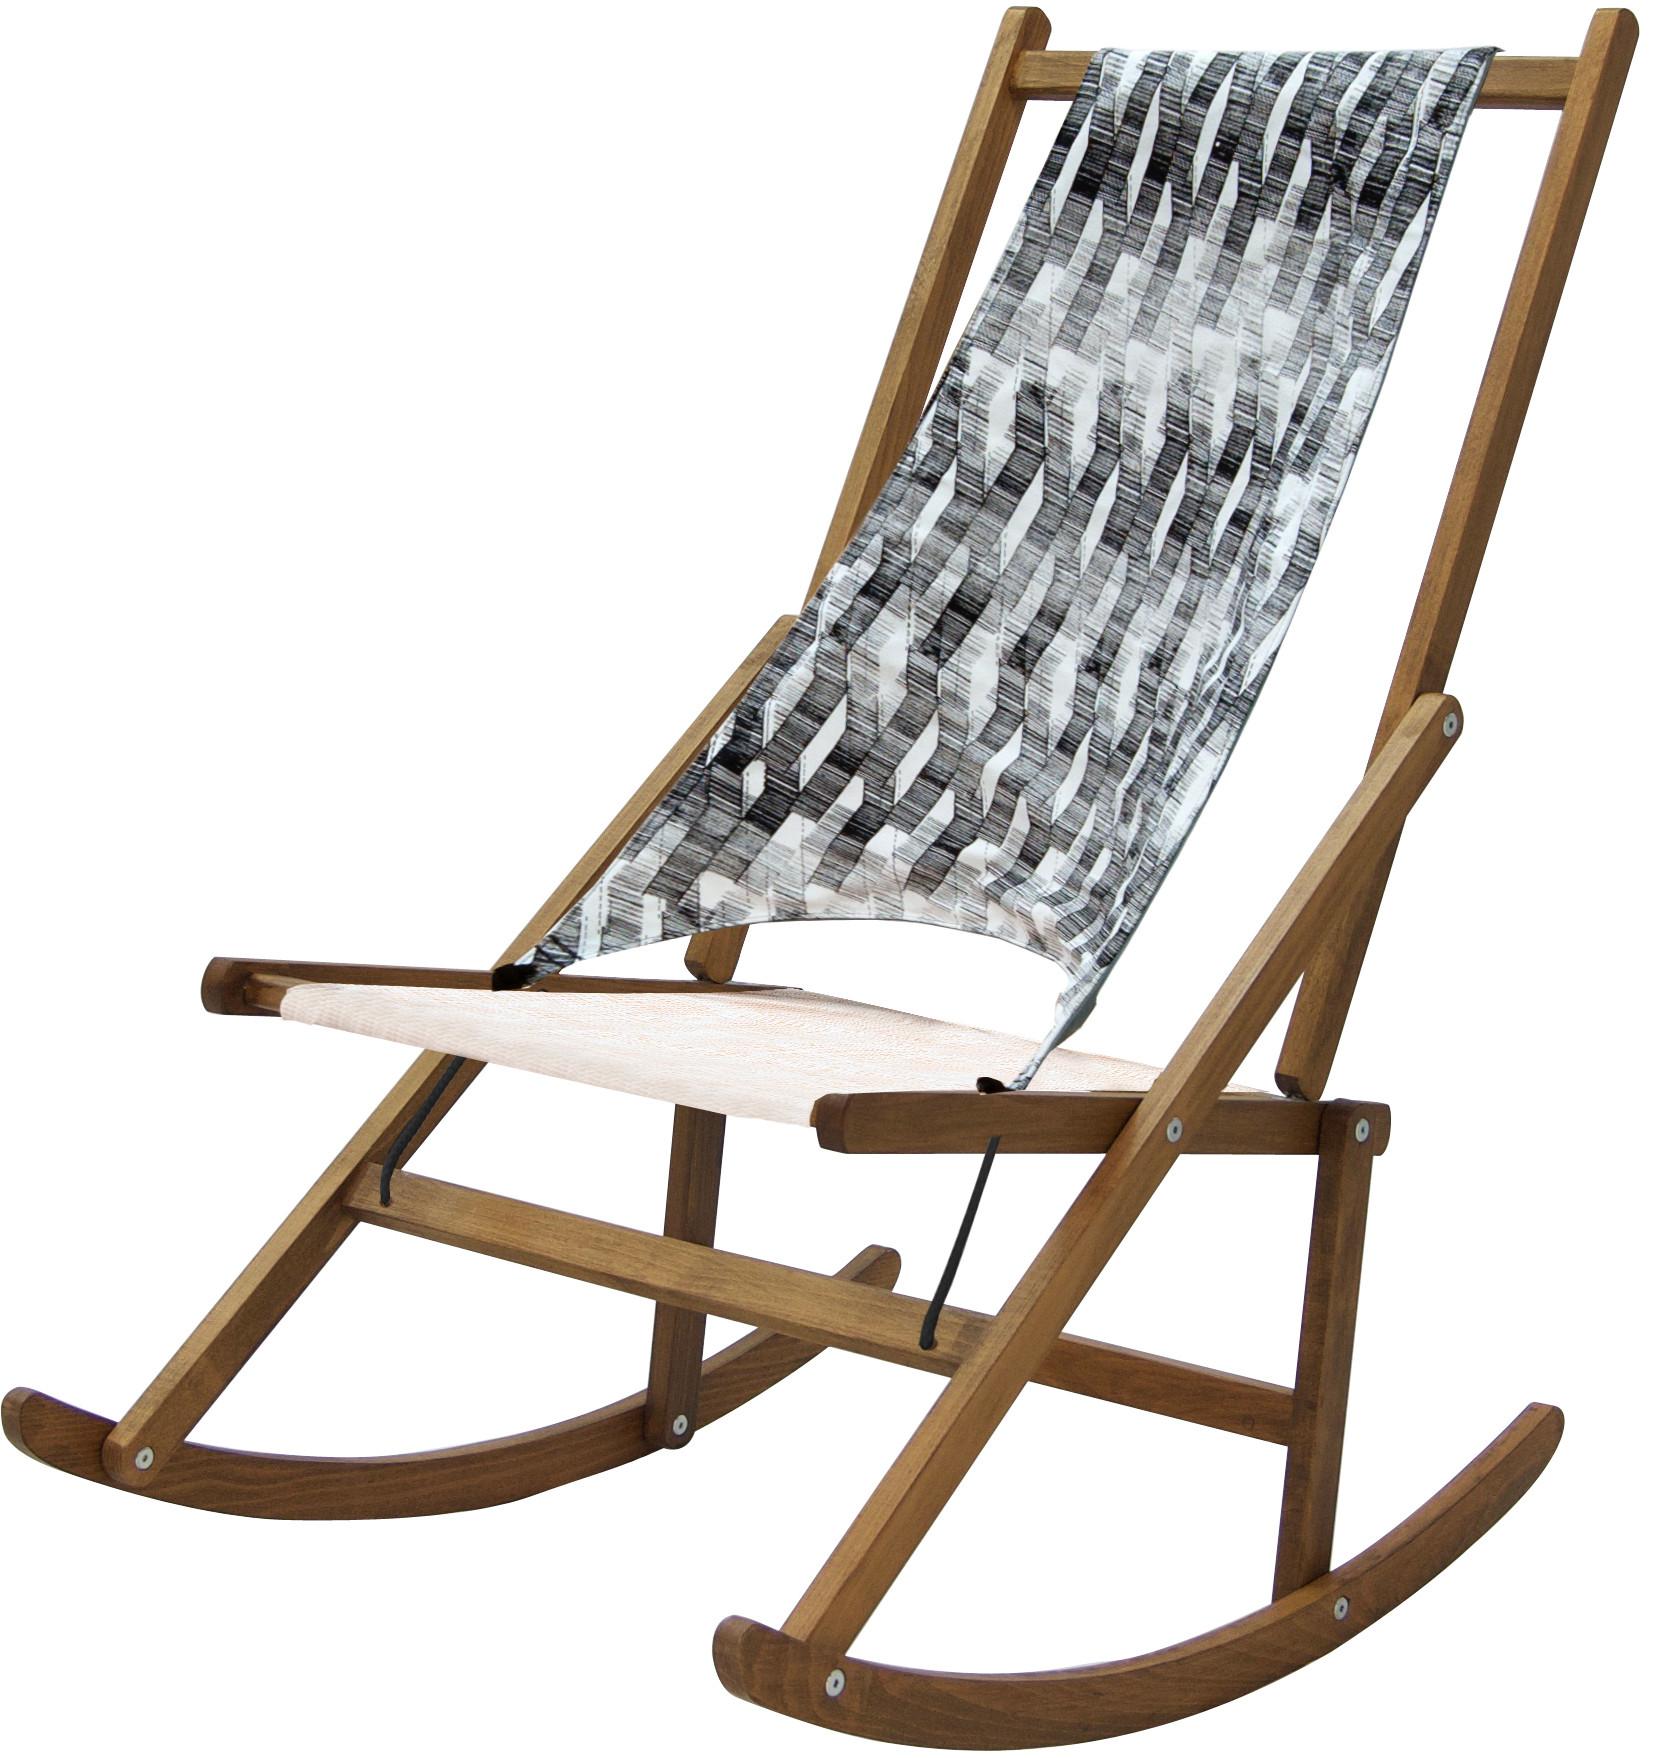 Folding Rocking Deck Chair Limited Edition WAWA